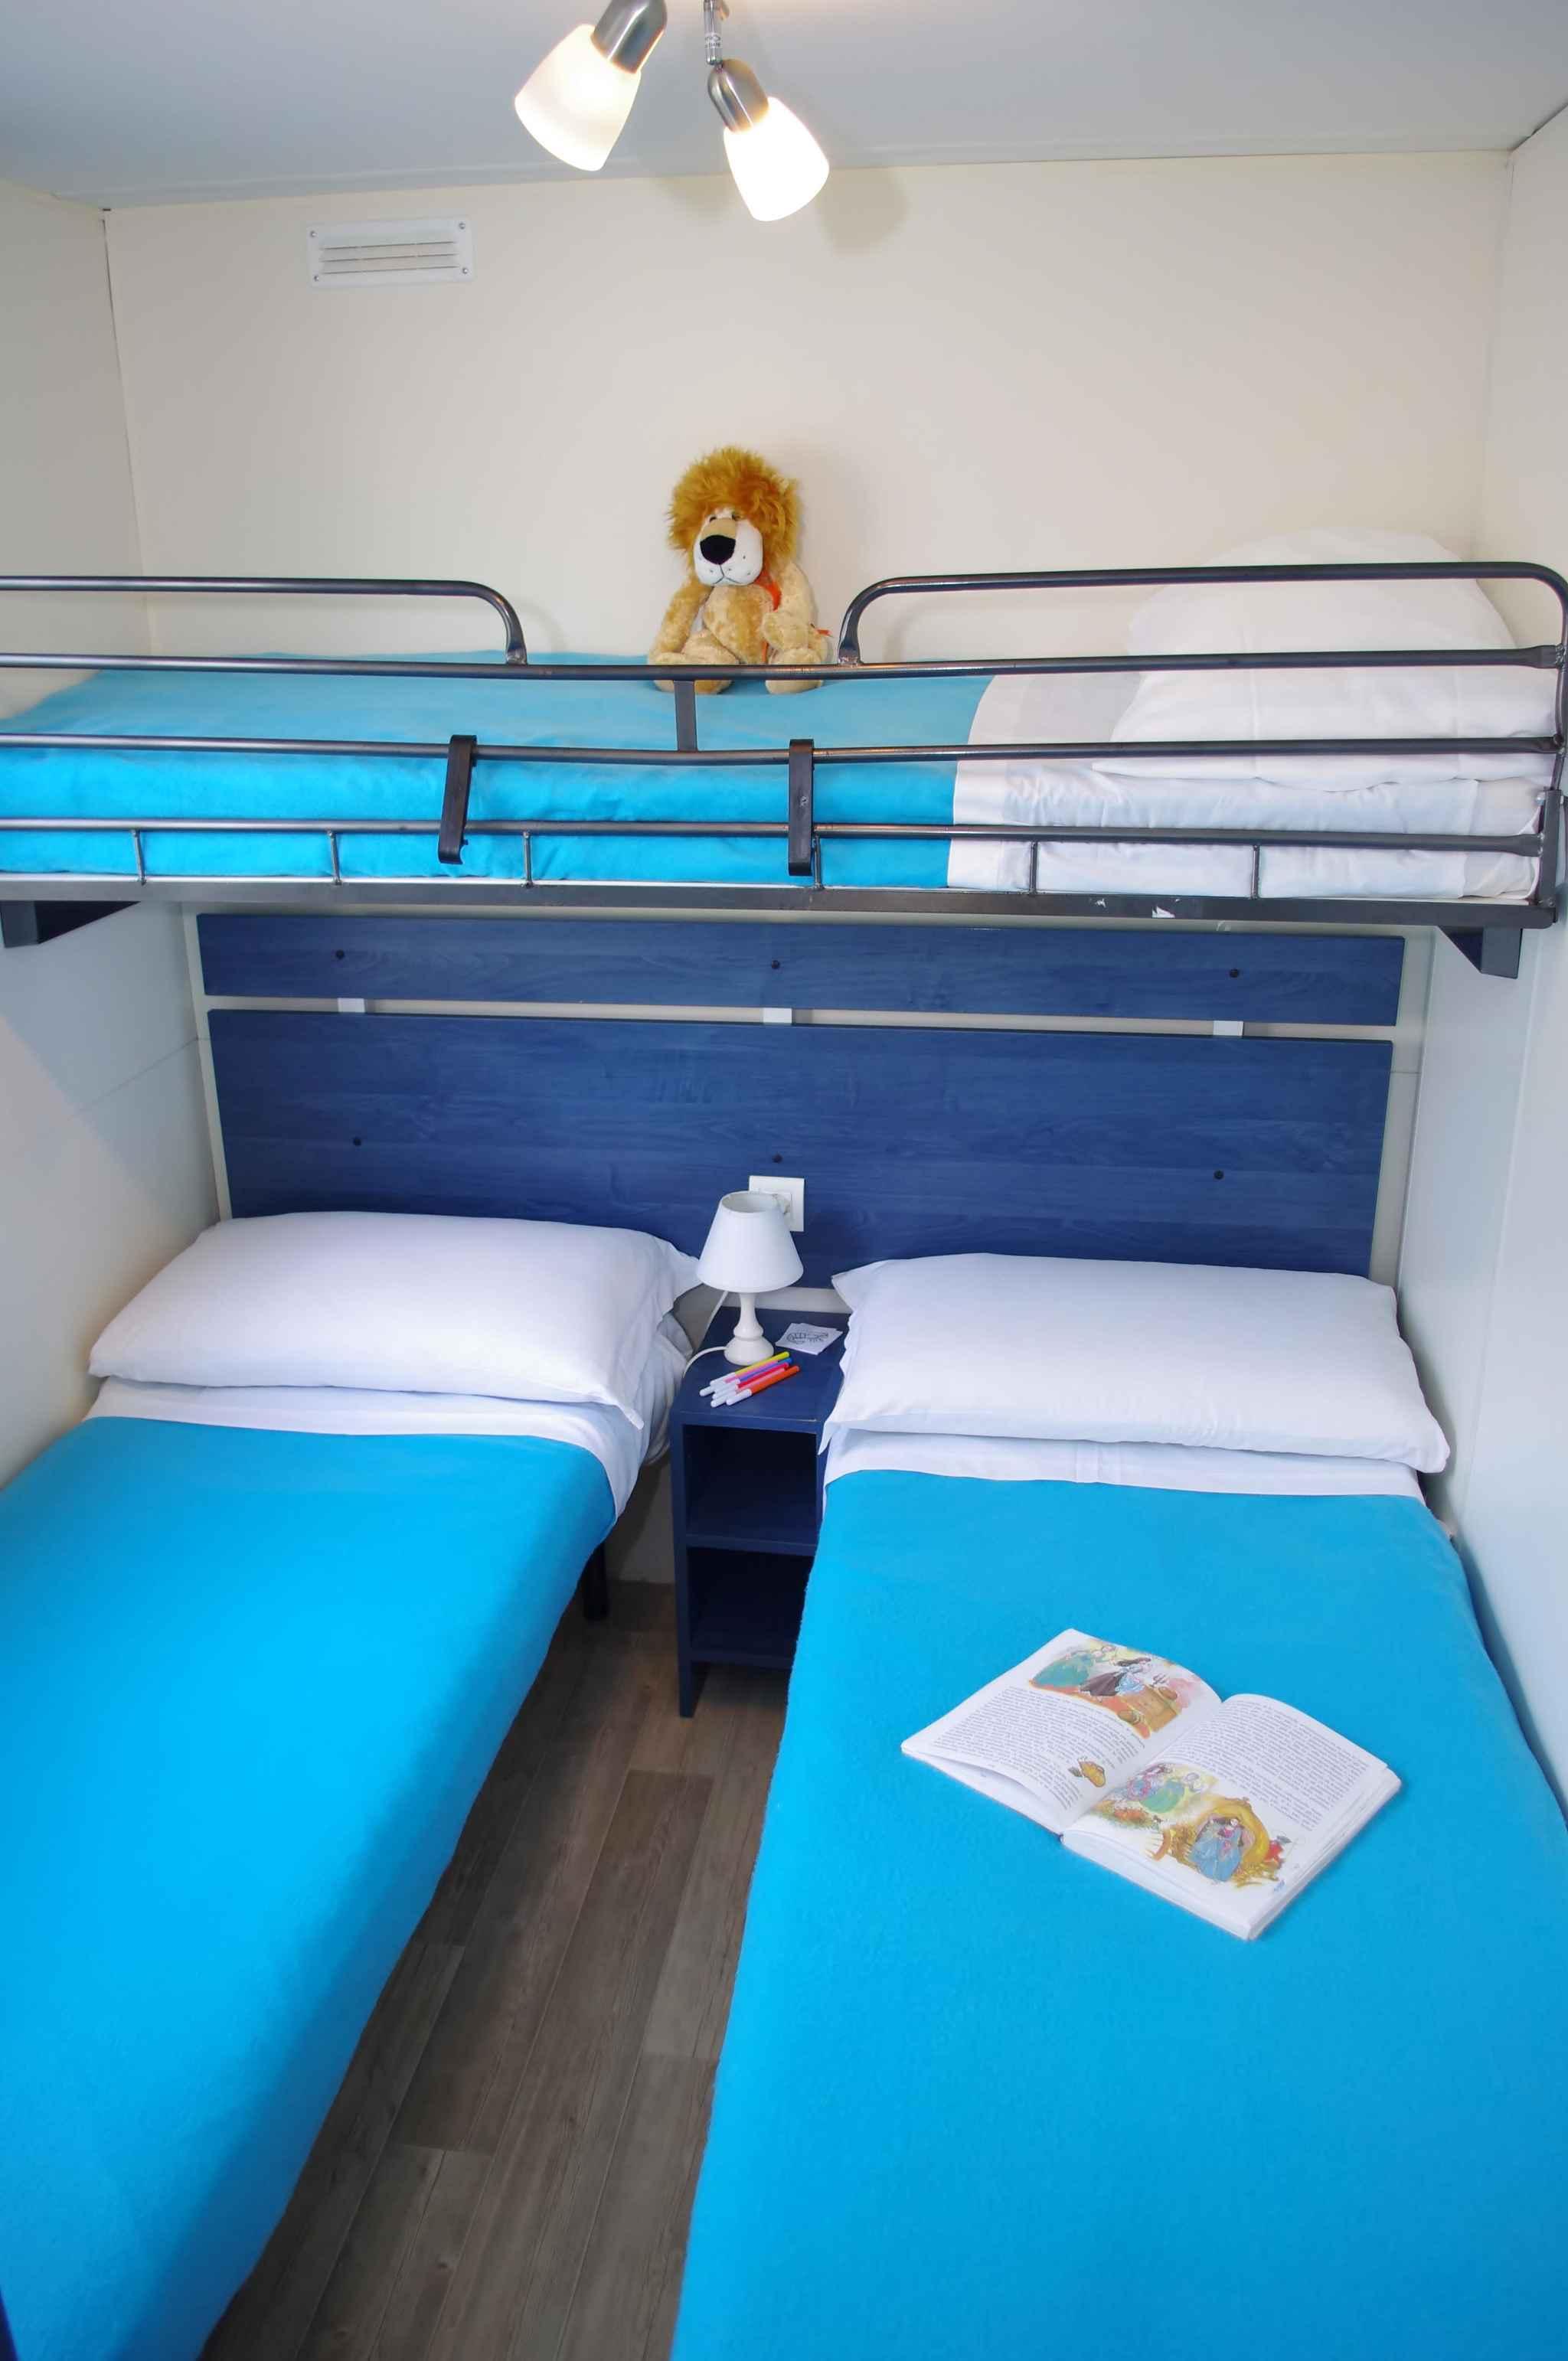 Appartement de vacances Mobilehome mit Tischtennis und Fahrradverleih (2483443), San Vito Lo Capo, Trapani, Sicile, Italie, image 15